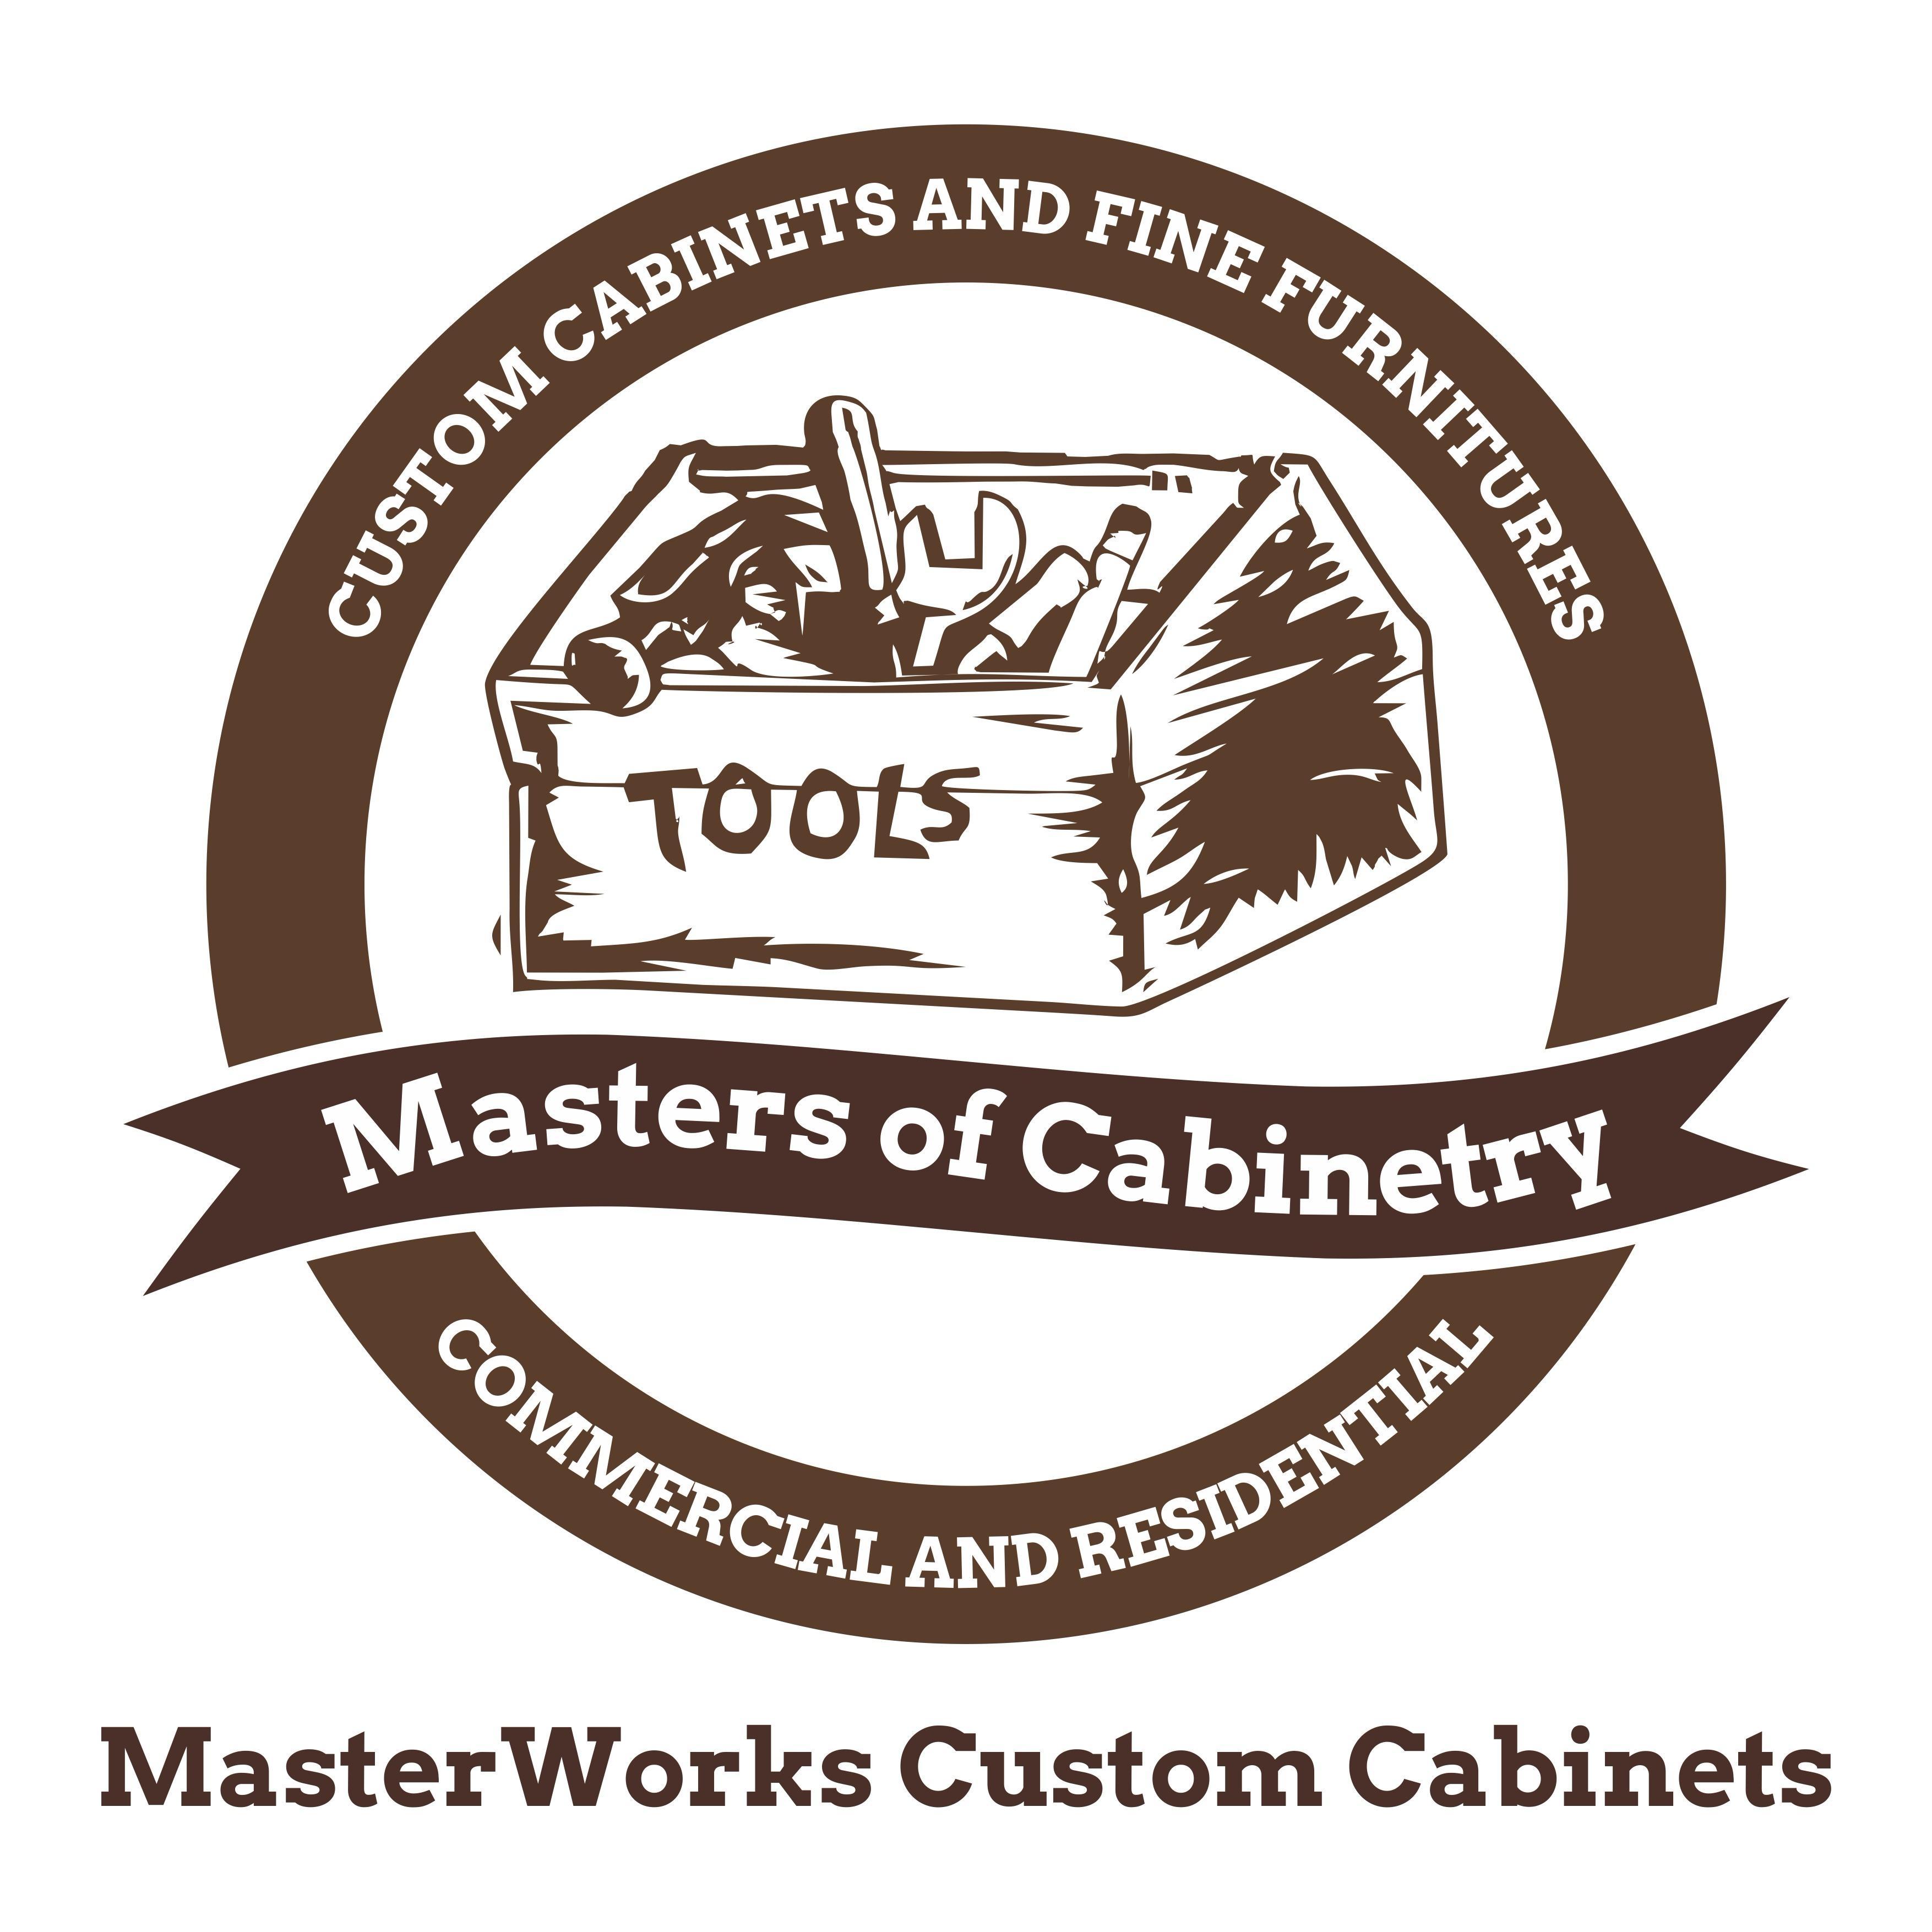 MasterWorks Custom Cabinets image 3